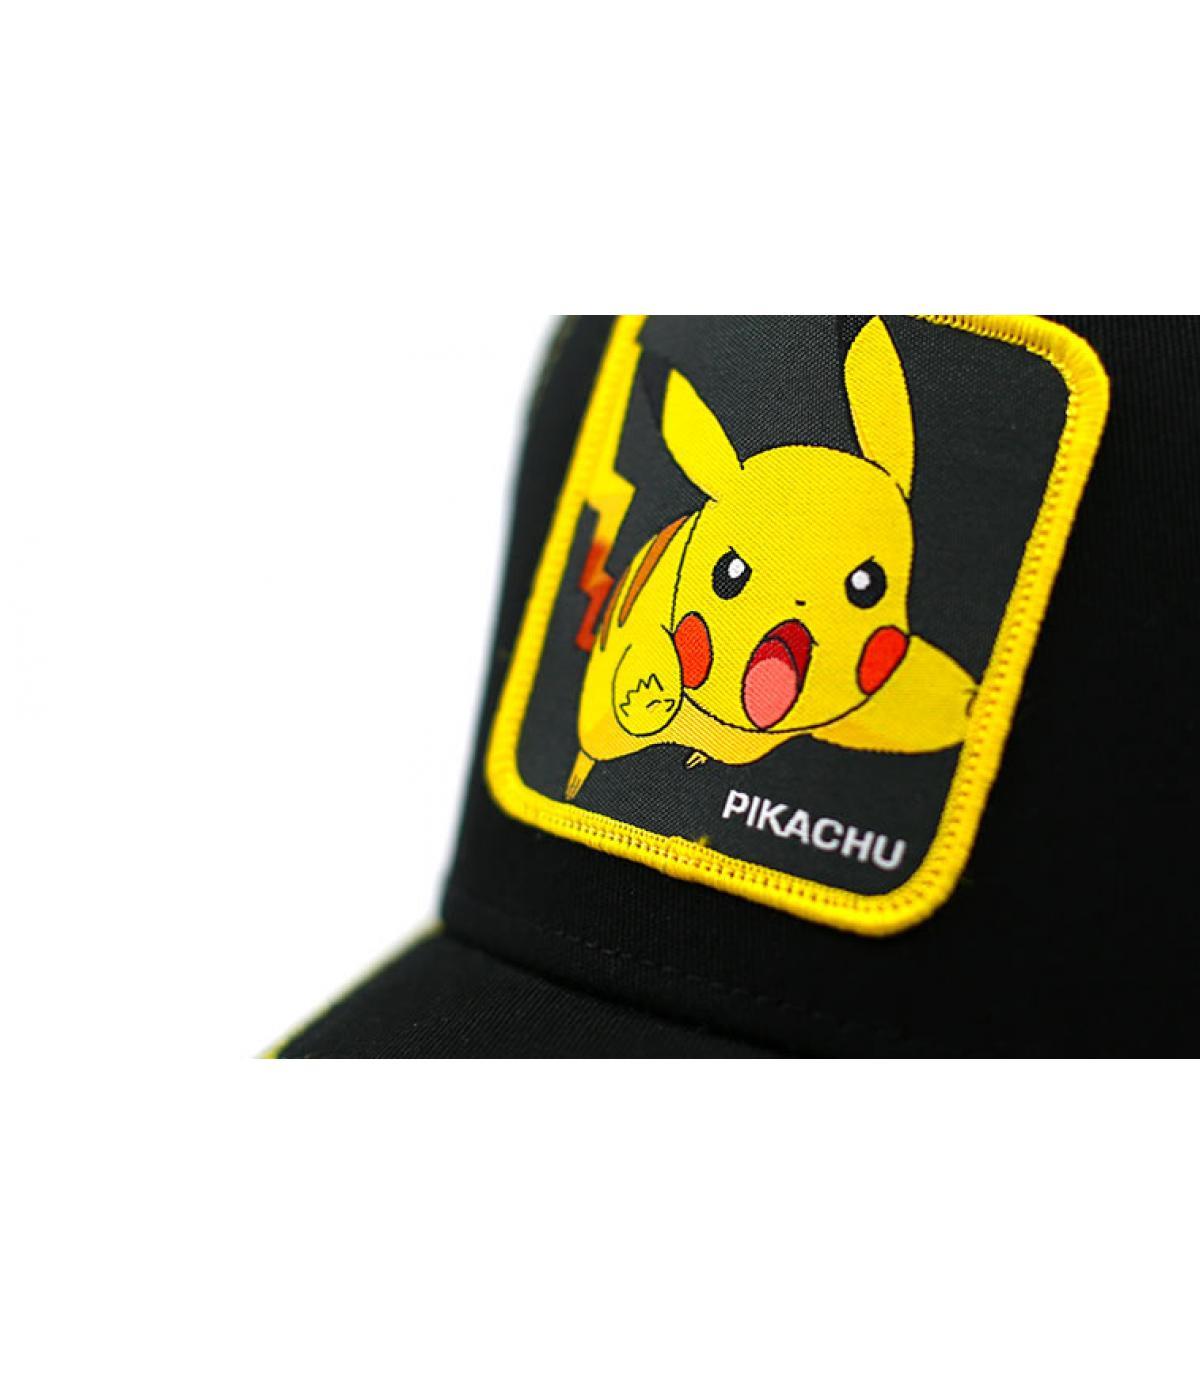 Dettagli Trucker Pokelon Pikachu - image 3